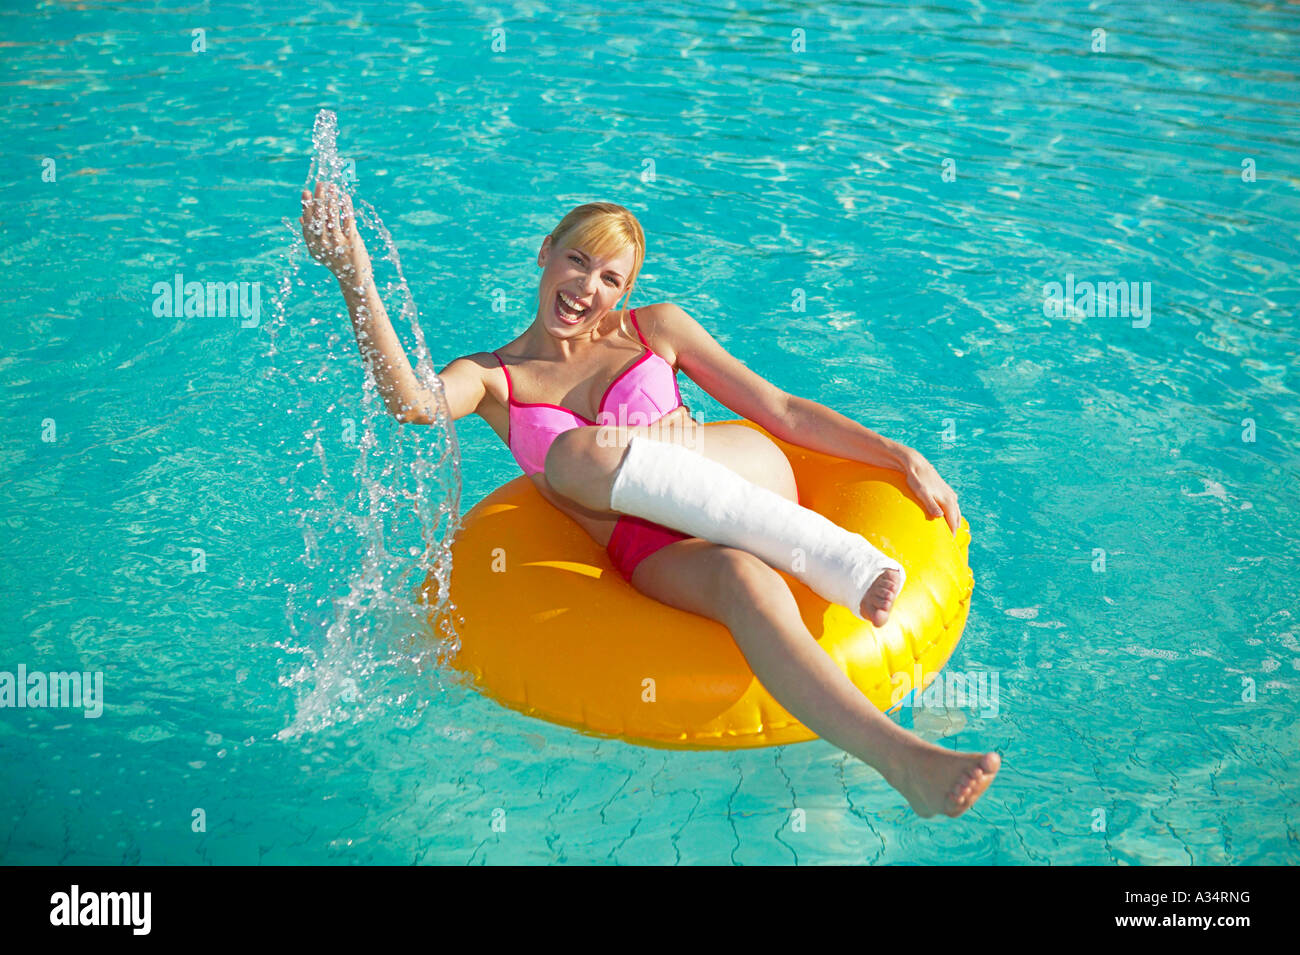 Frau mit gipsbein auf gummireifen im pool frau mit bein for Pool aus gummi